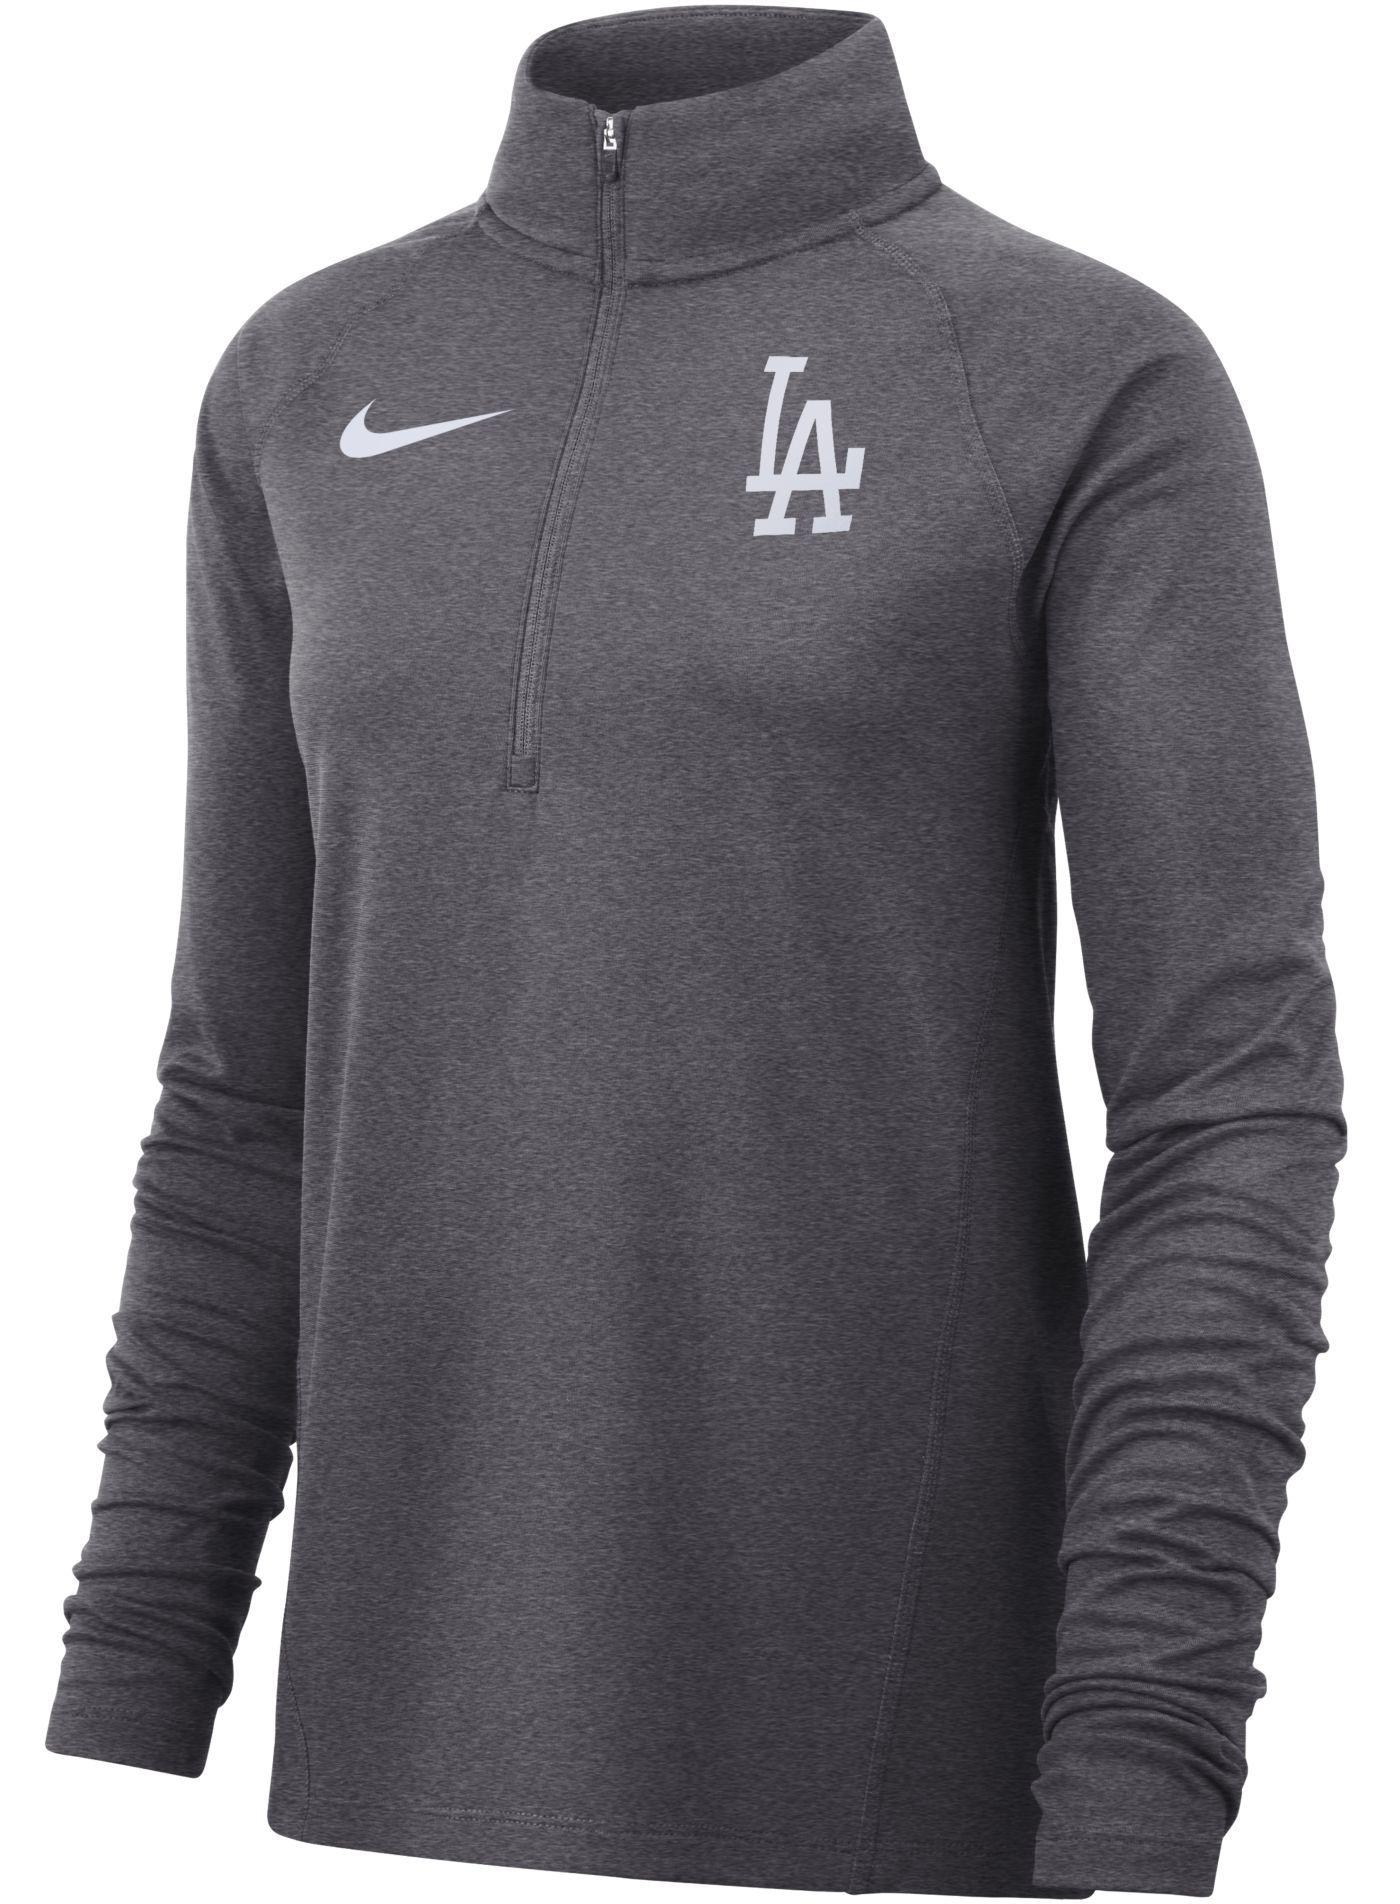 Nike Women's Los Angeles Dodgers Dri-FIT Half-Zip Pullover